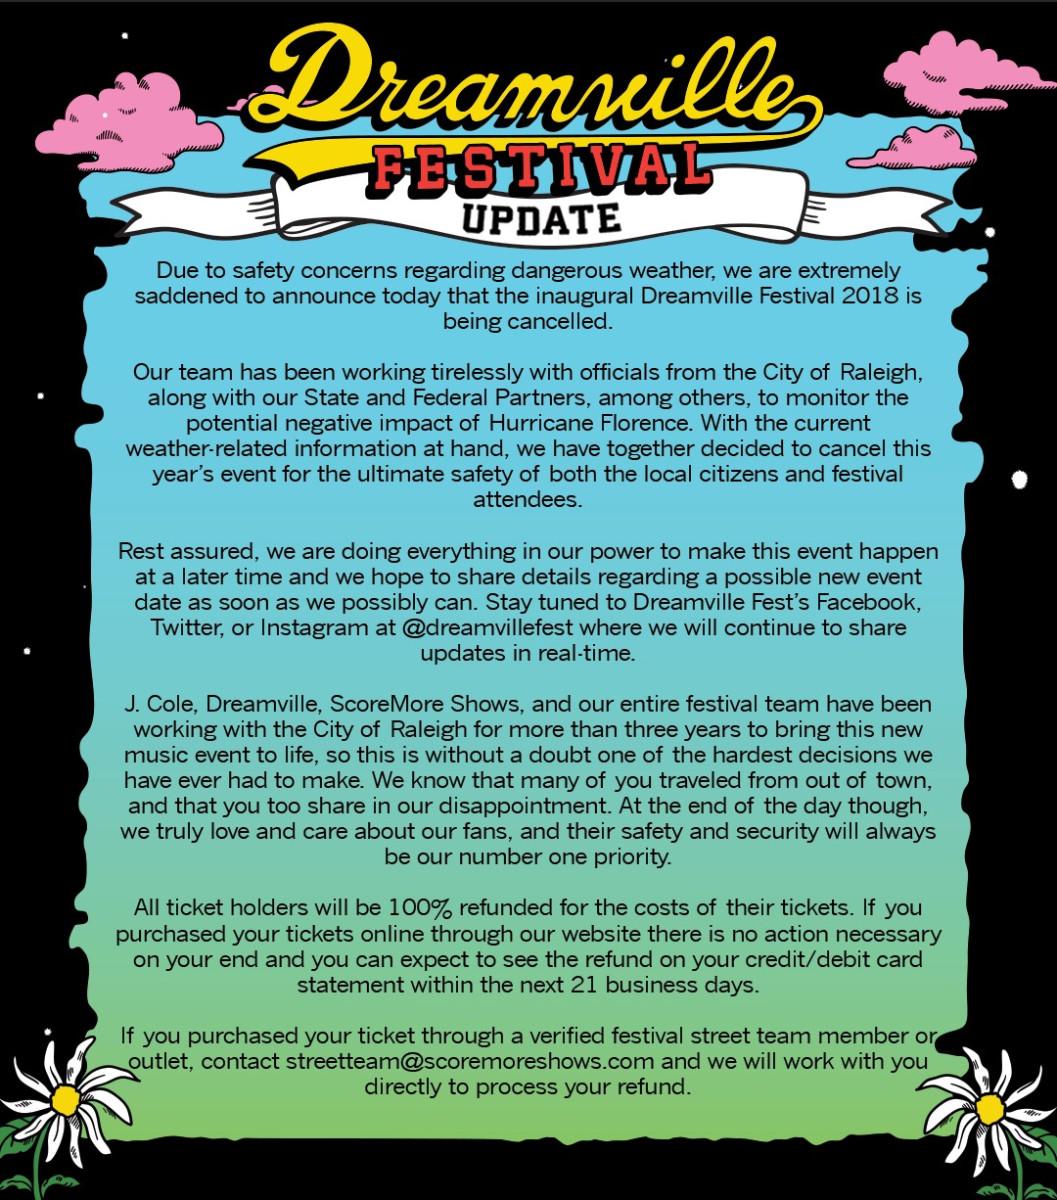 Dreamville Festival 2018 Update